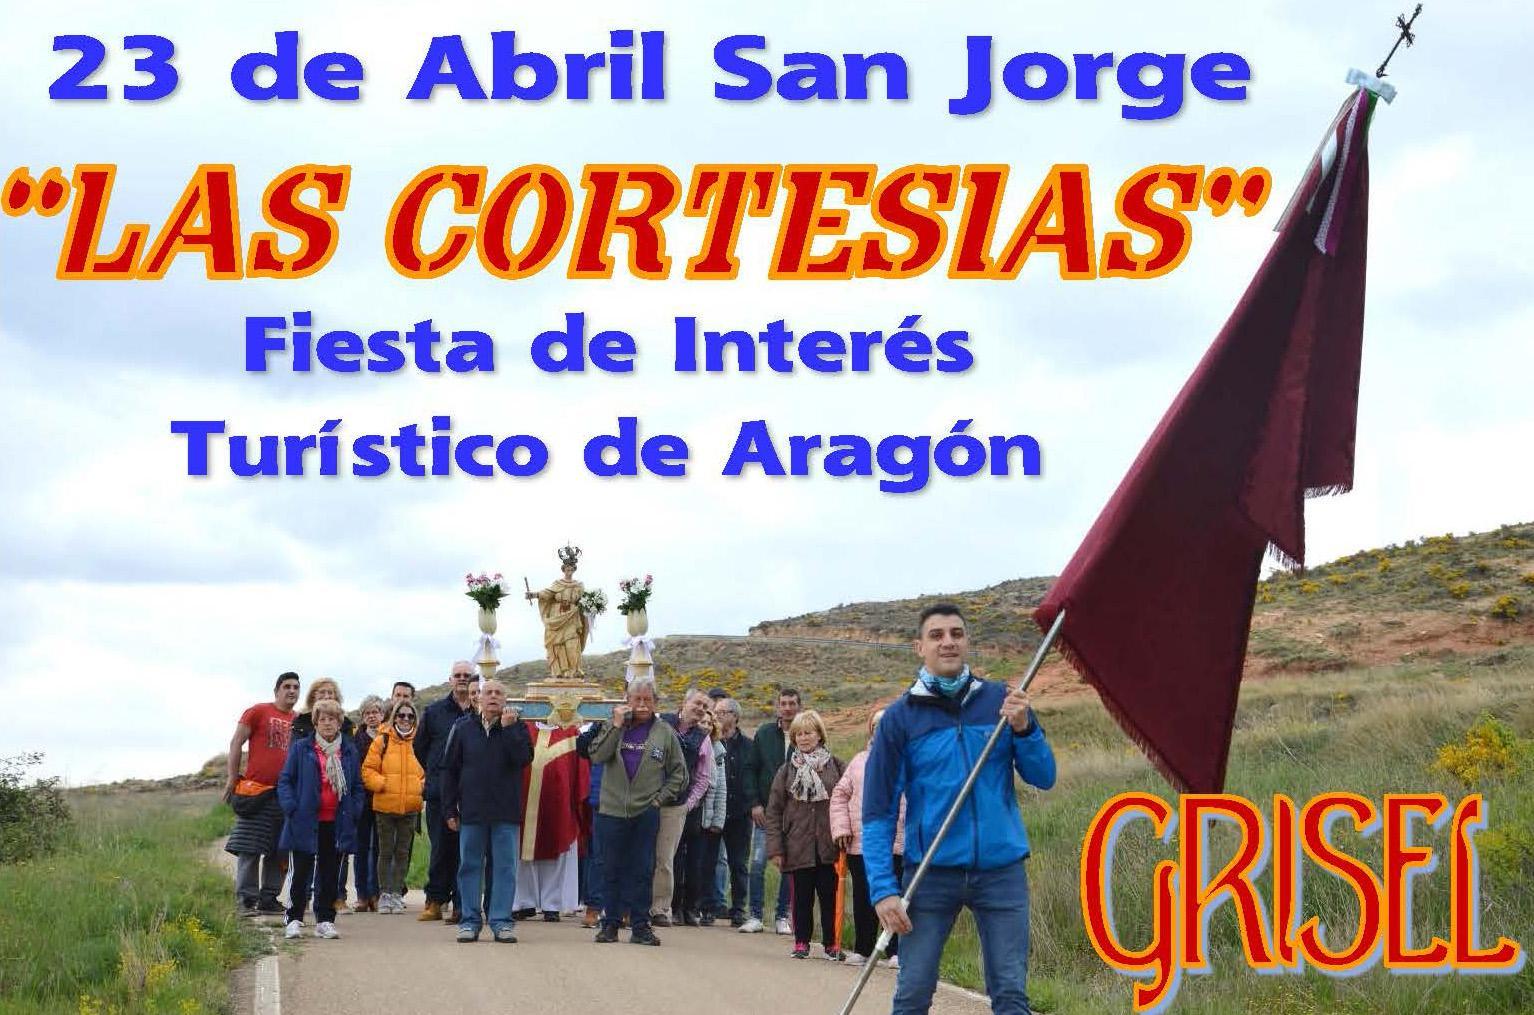 Page 12 of San Jorge 2020